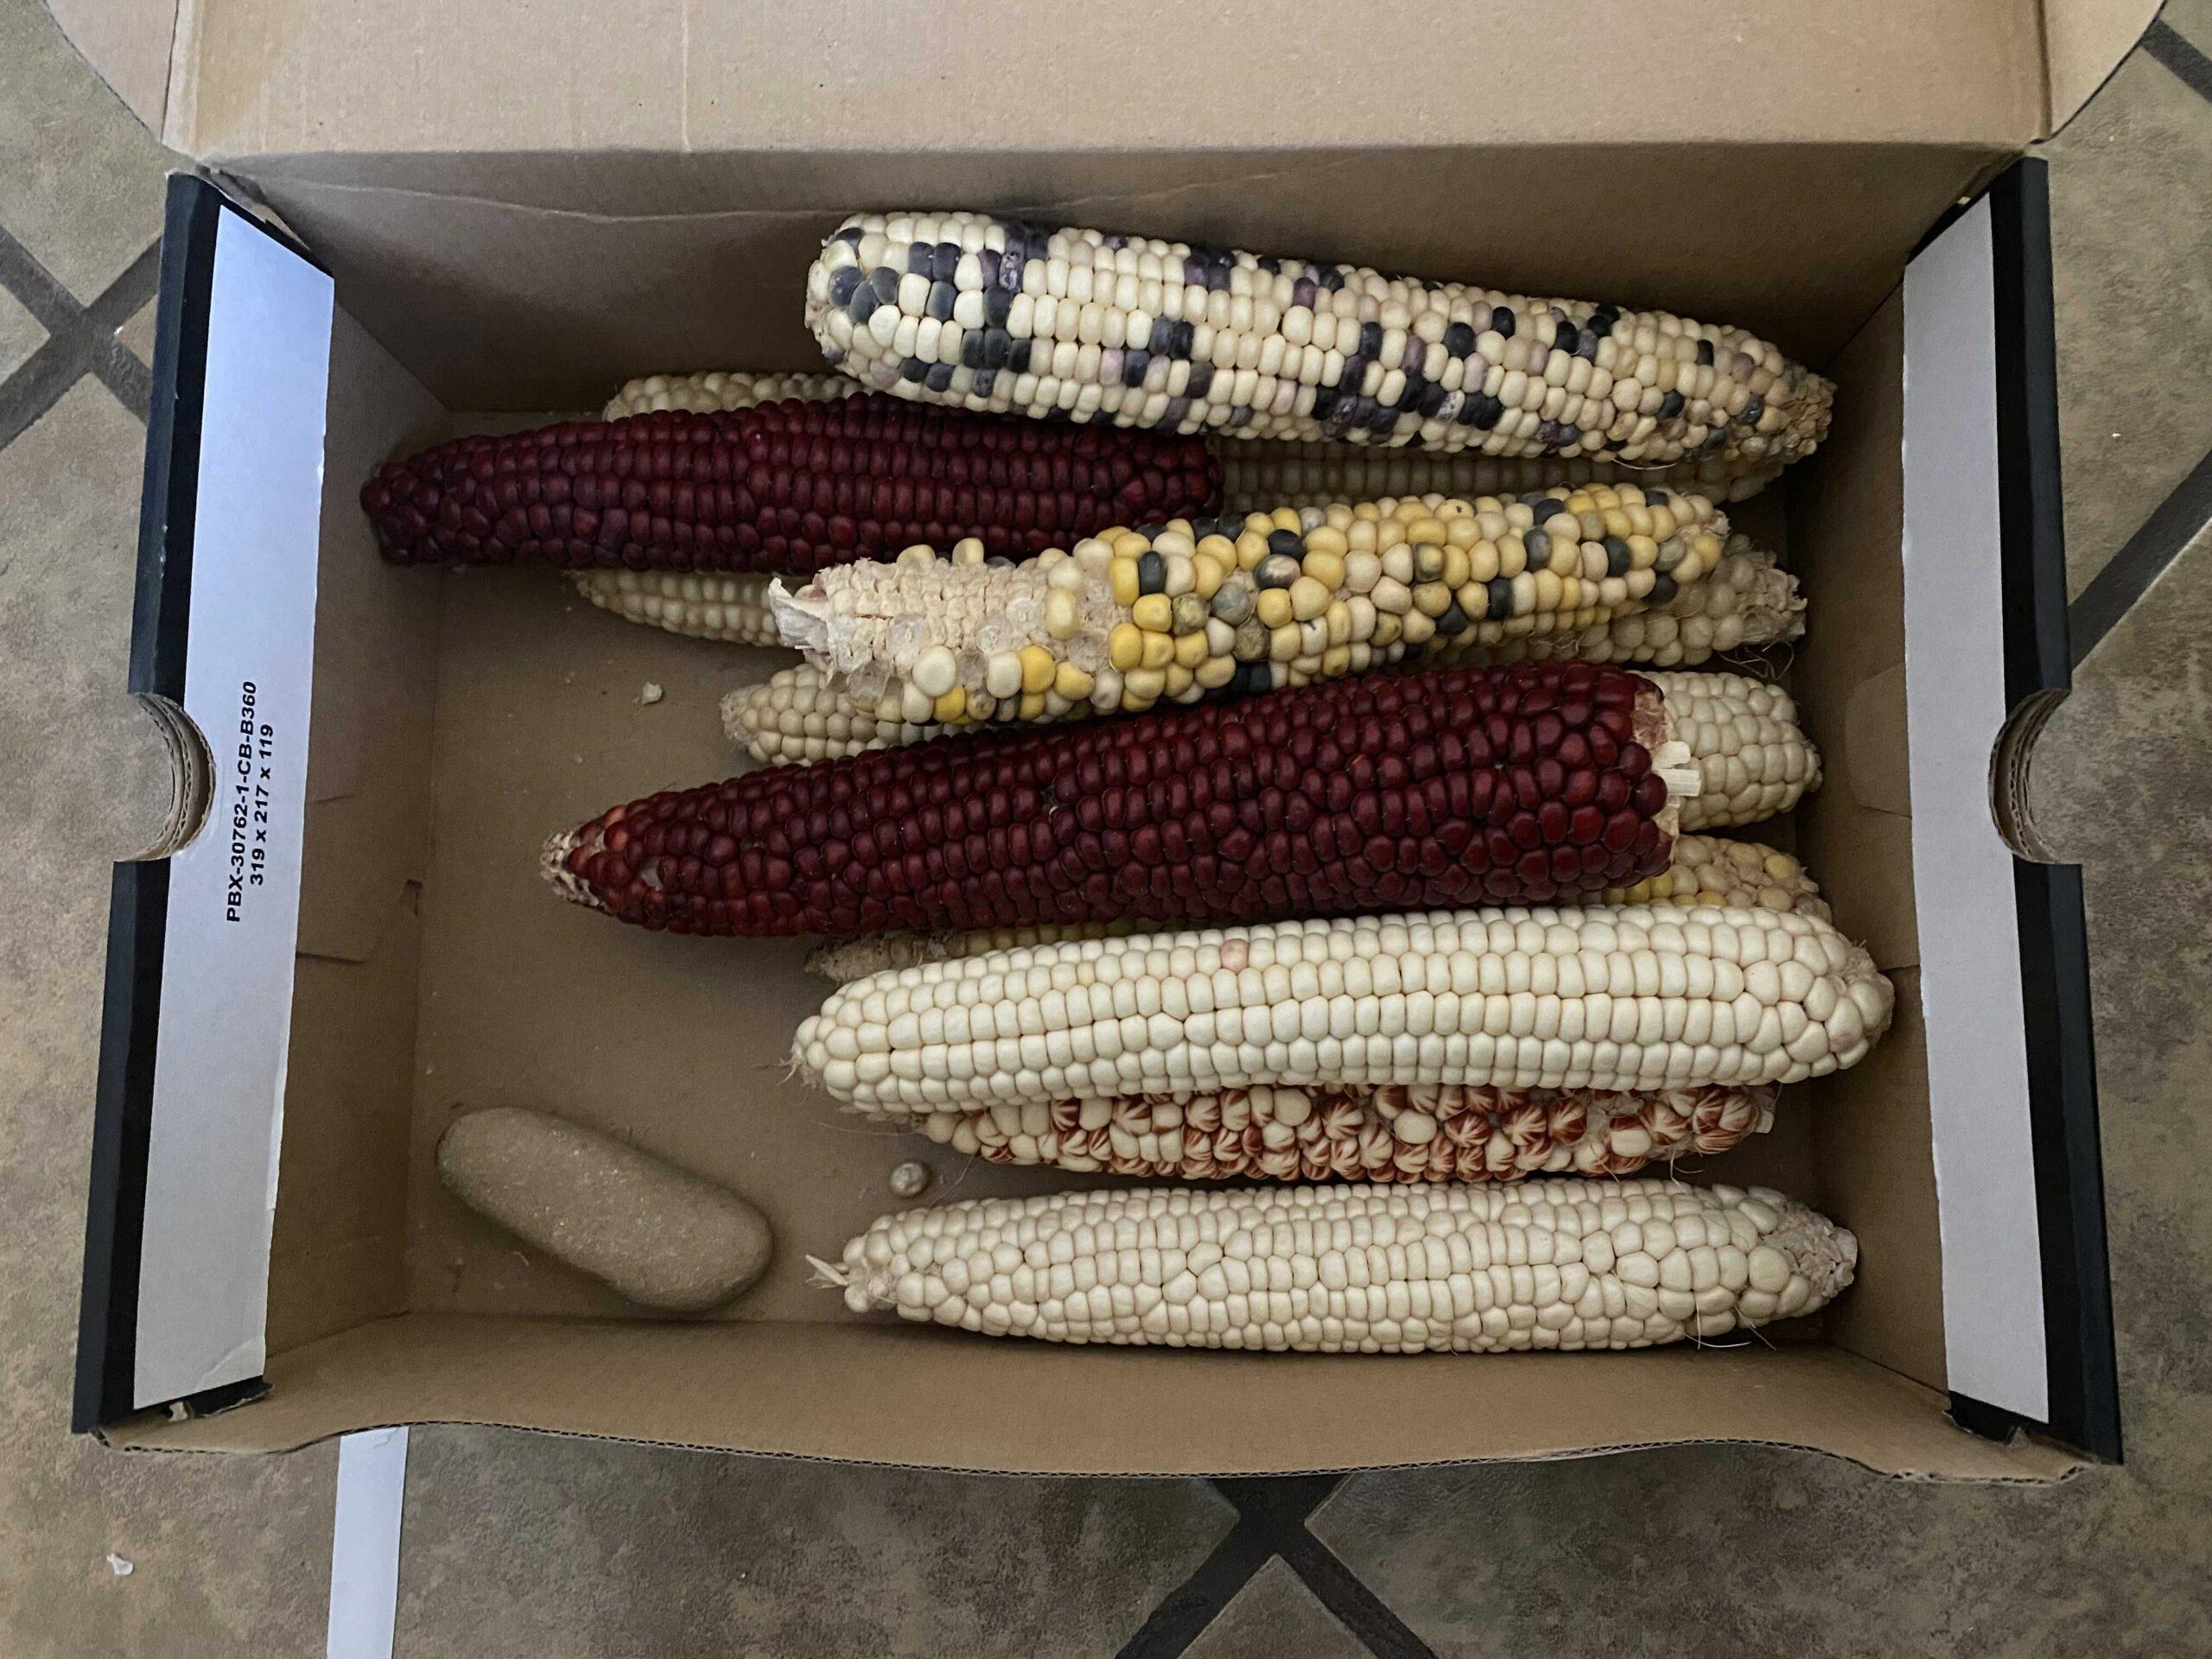 Multicolored ears of corn in a shoe box.